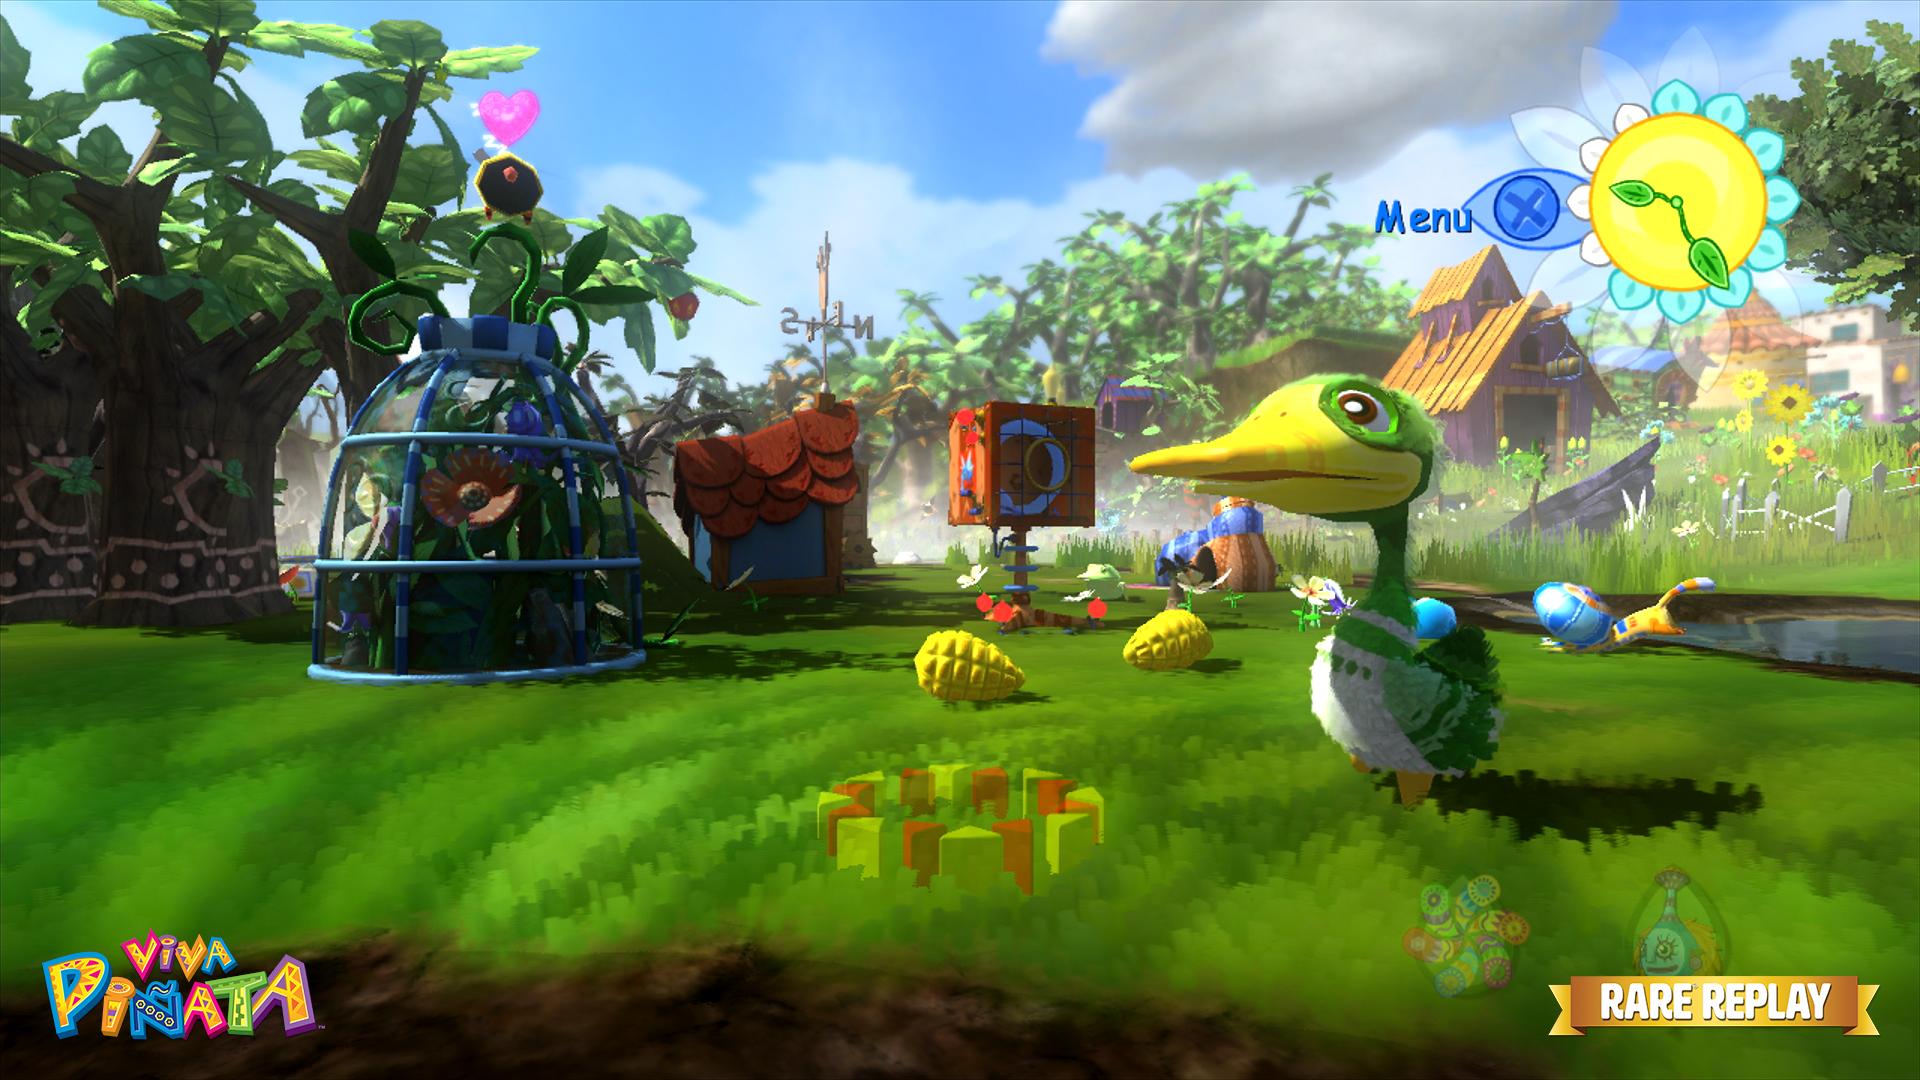 Rare Replay Viva Piñata Xbox 360 Animal Party Pinata Rare